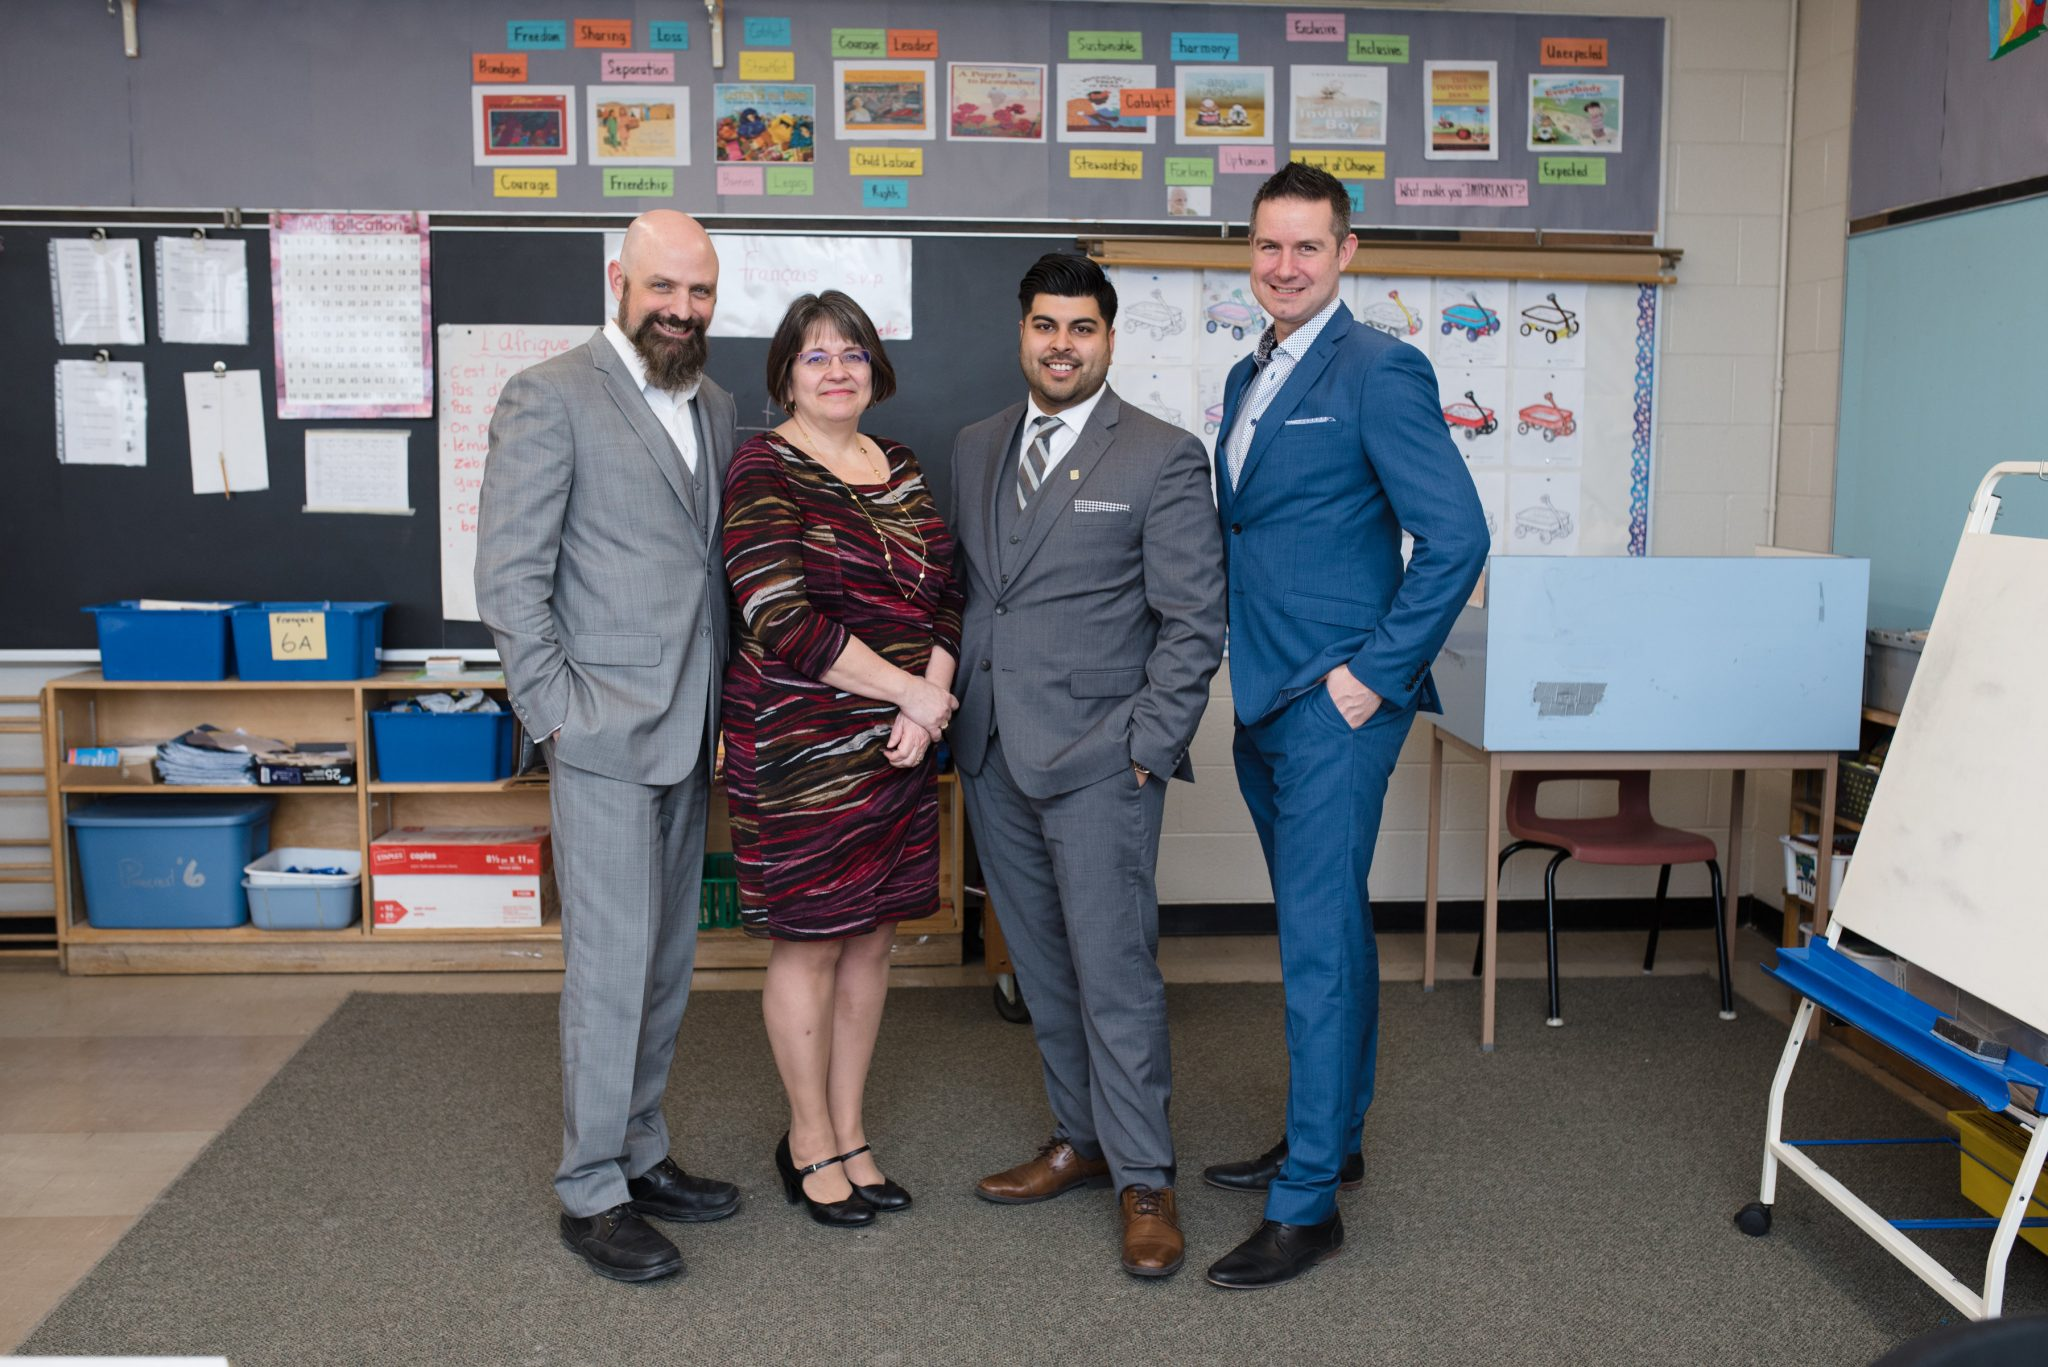 JA Ottawa, ONFE, charity, Ottawa, non-profit, Ottawa Network for Education, volunteering